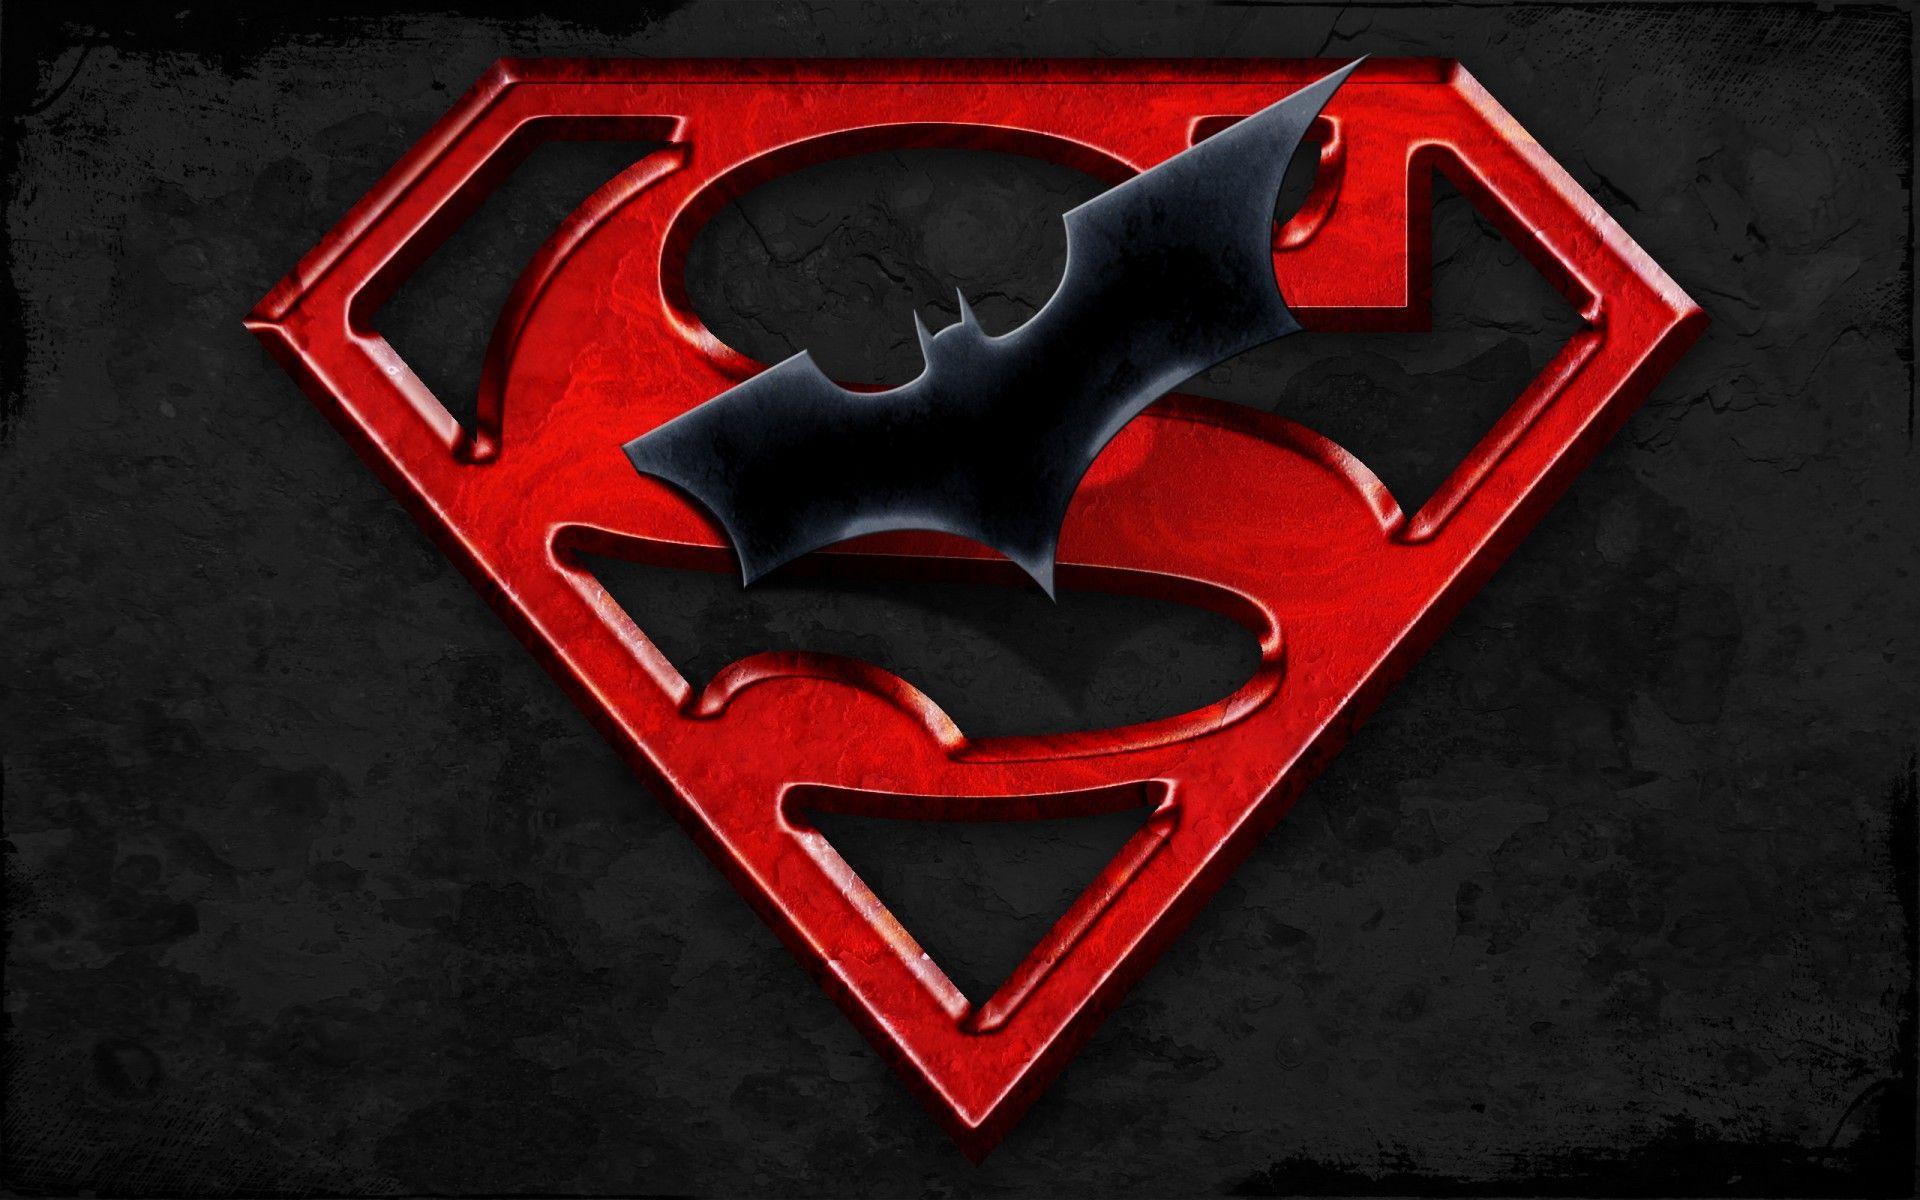 Superman batman logo background hd wallpaper food drink that i superman batman logo background hd wallpaper biocorpaavc Choice Image